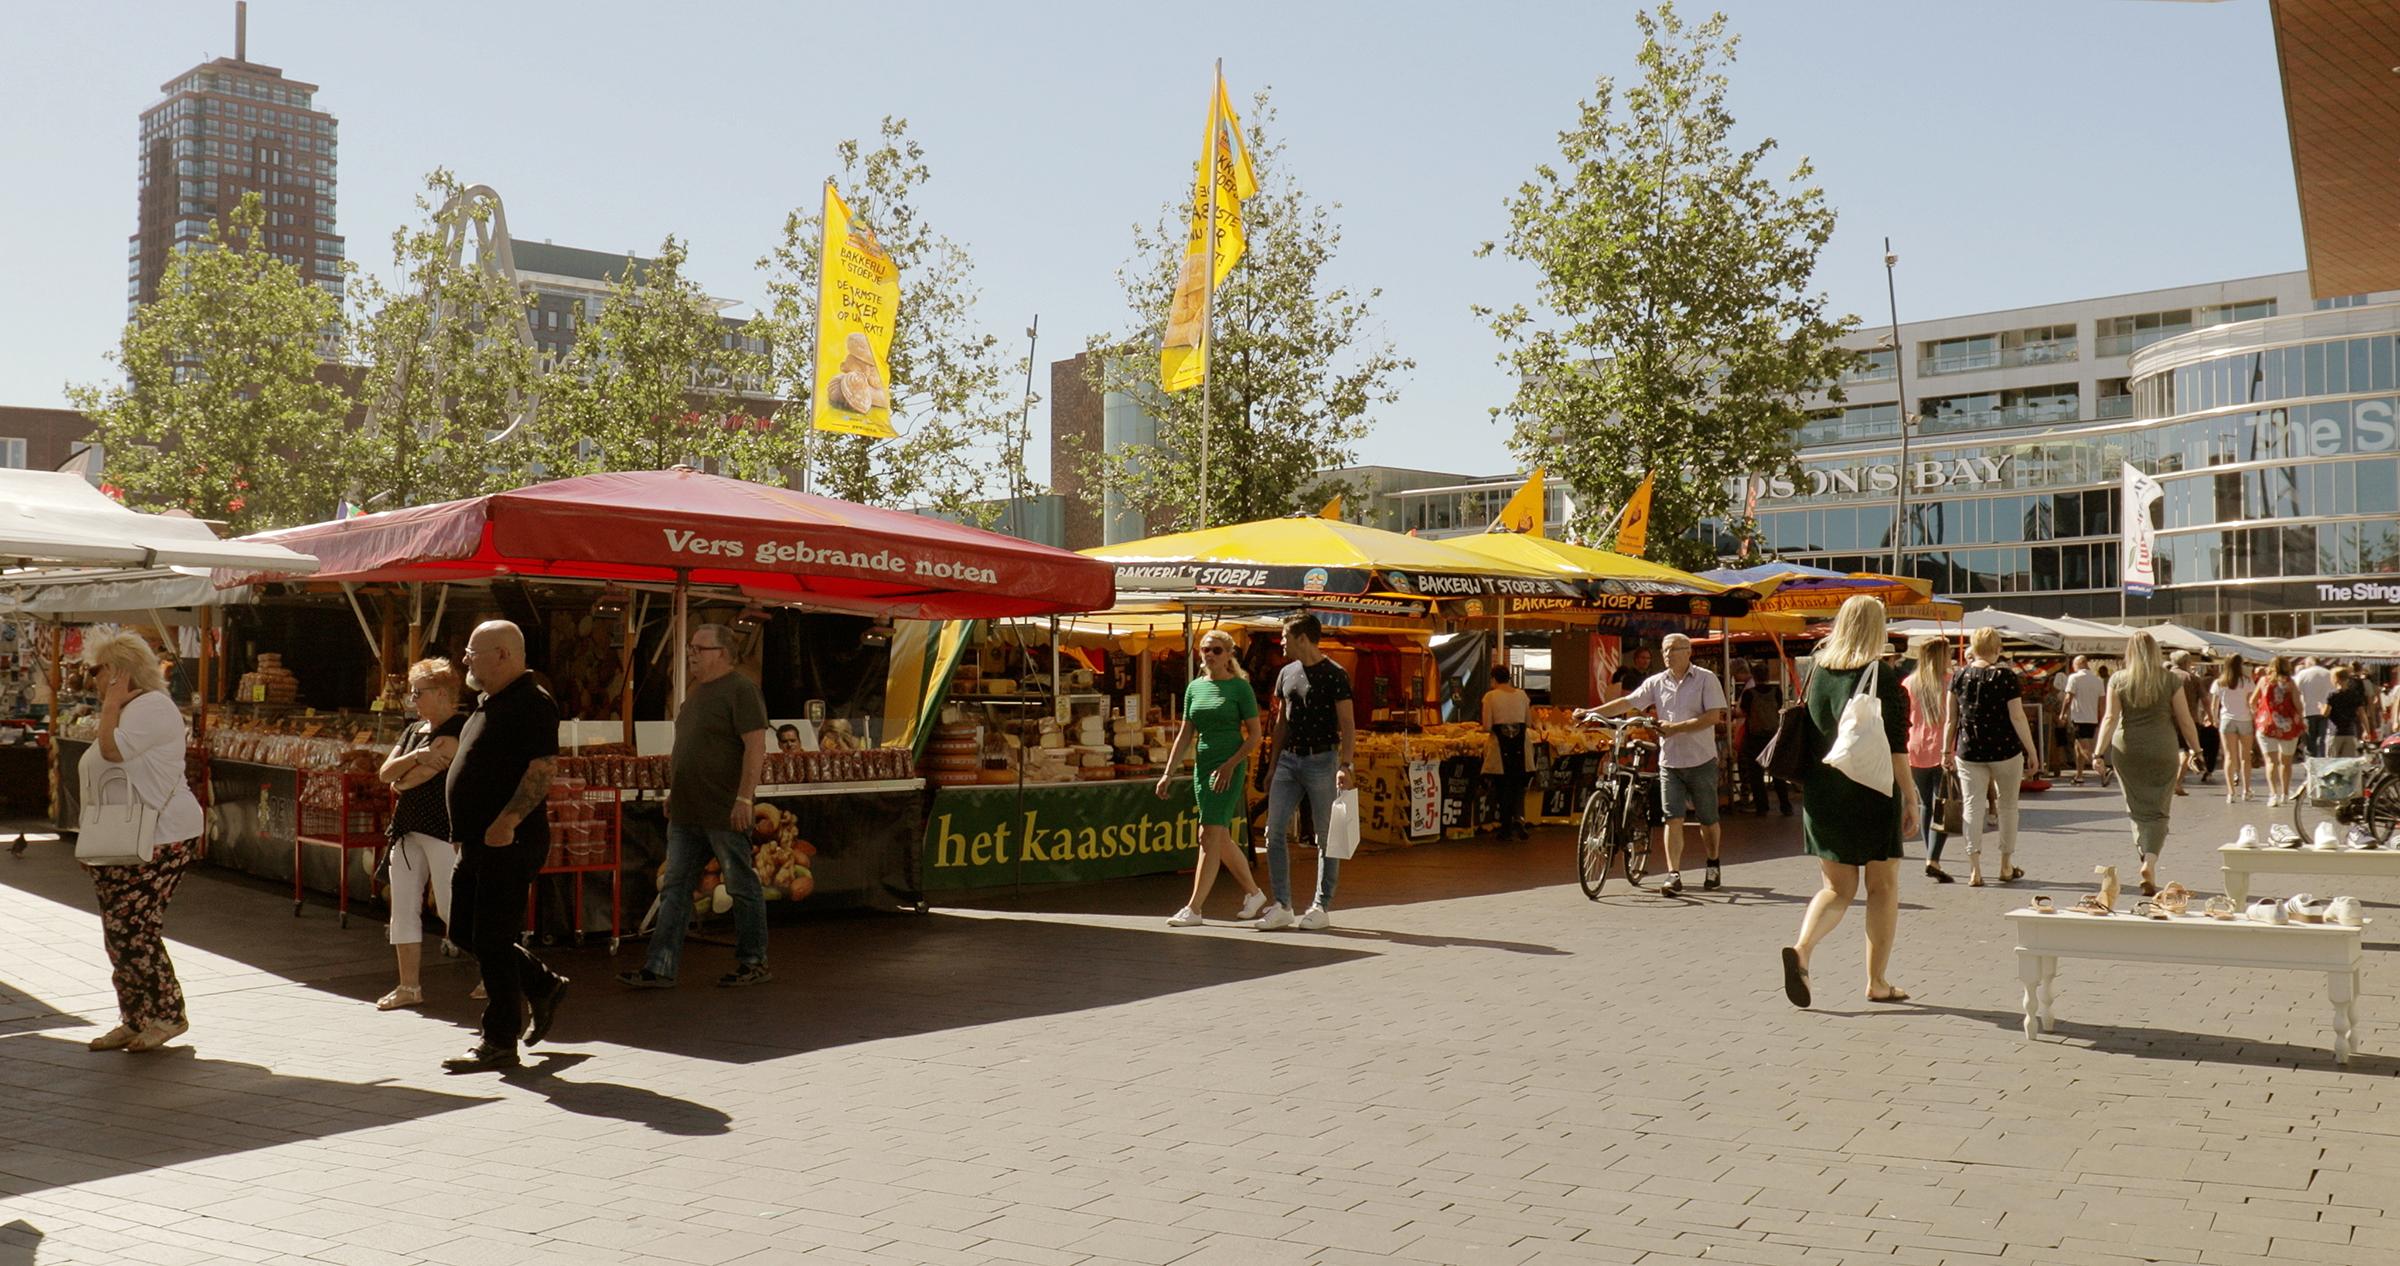 Market Enschede